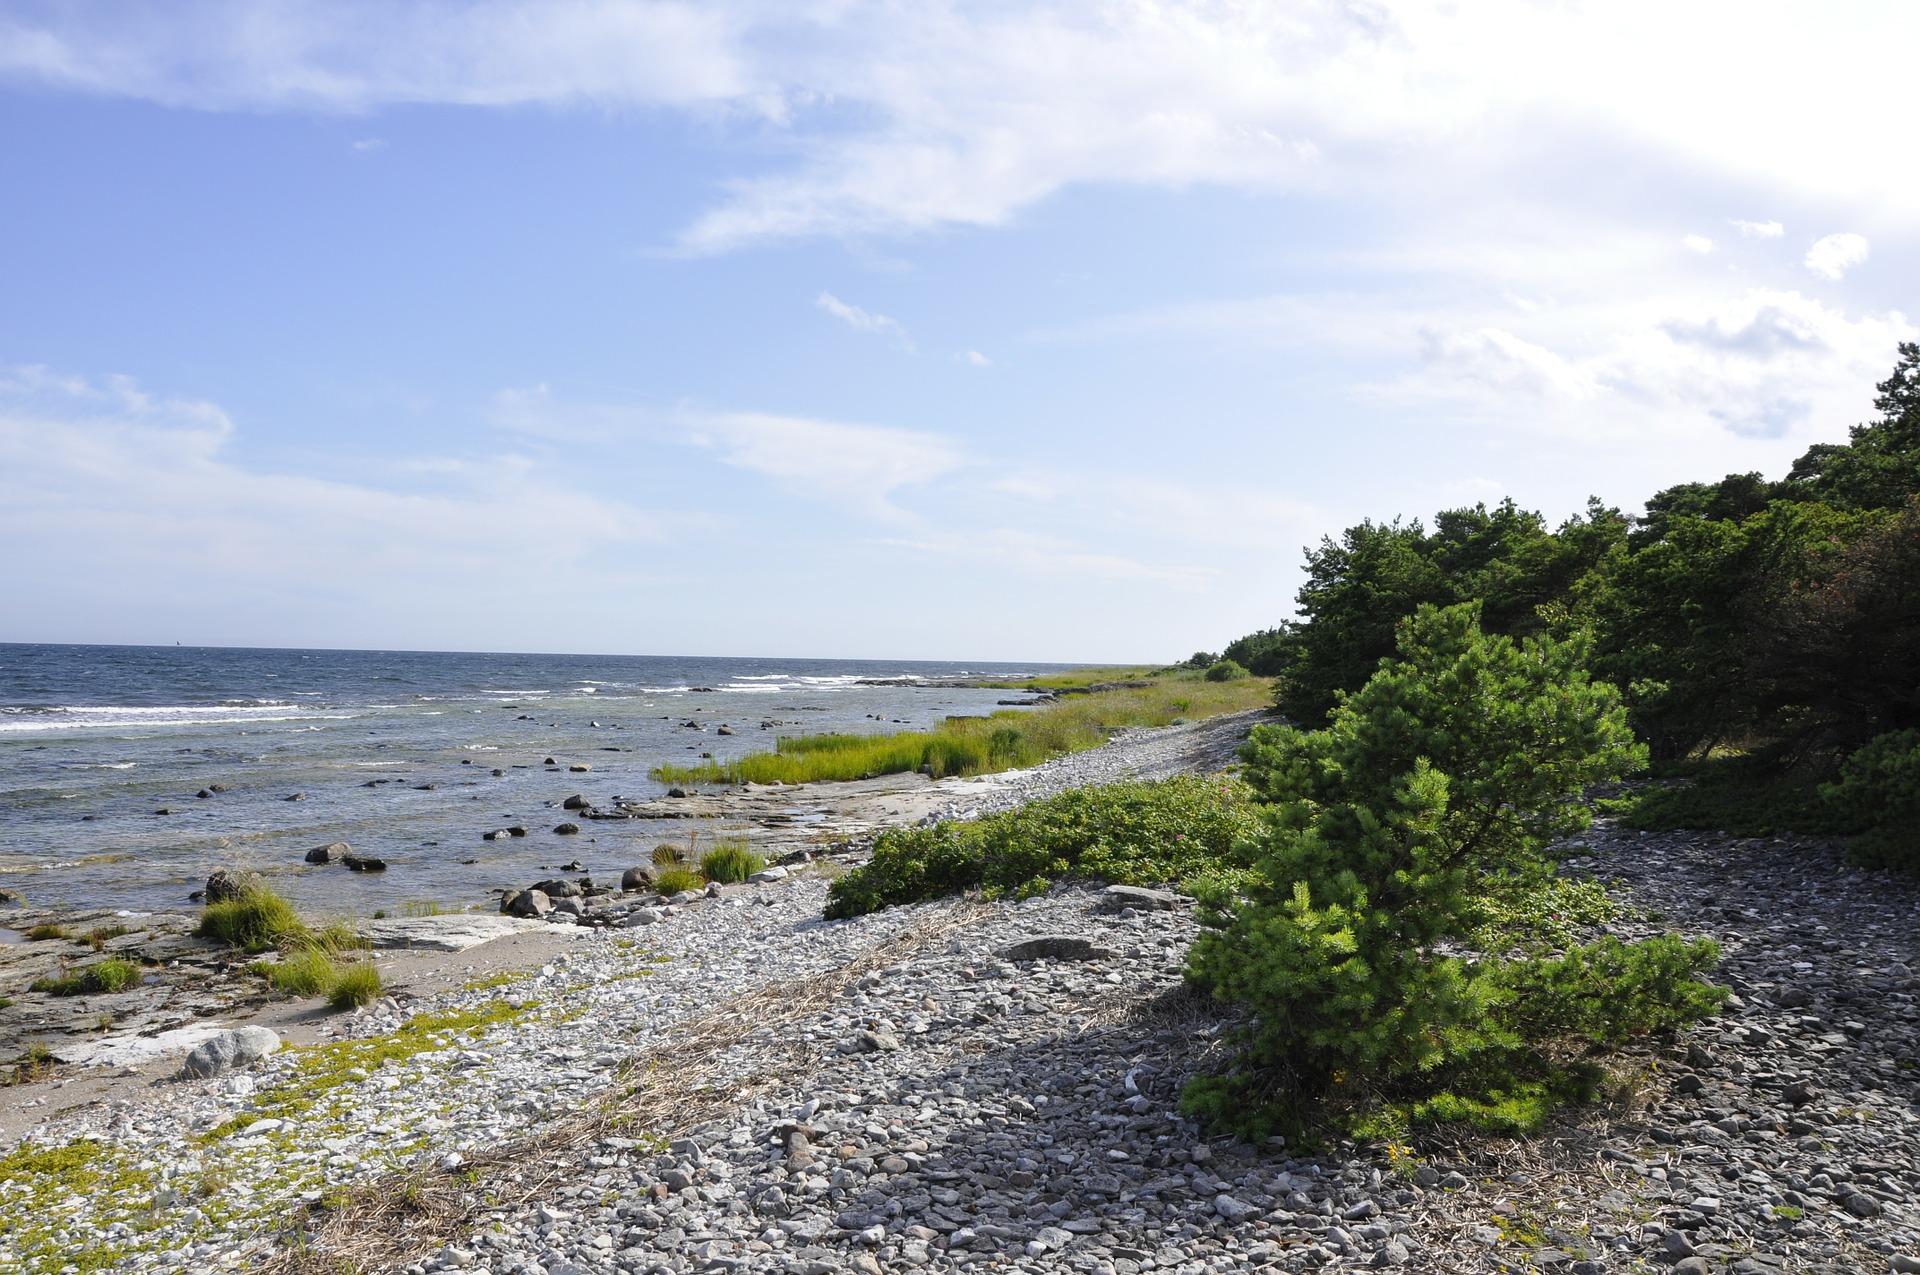 pebble-beach-133314_1920